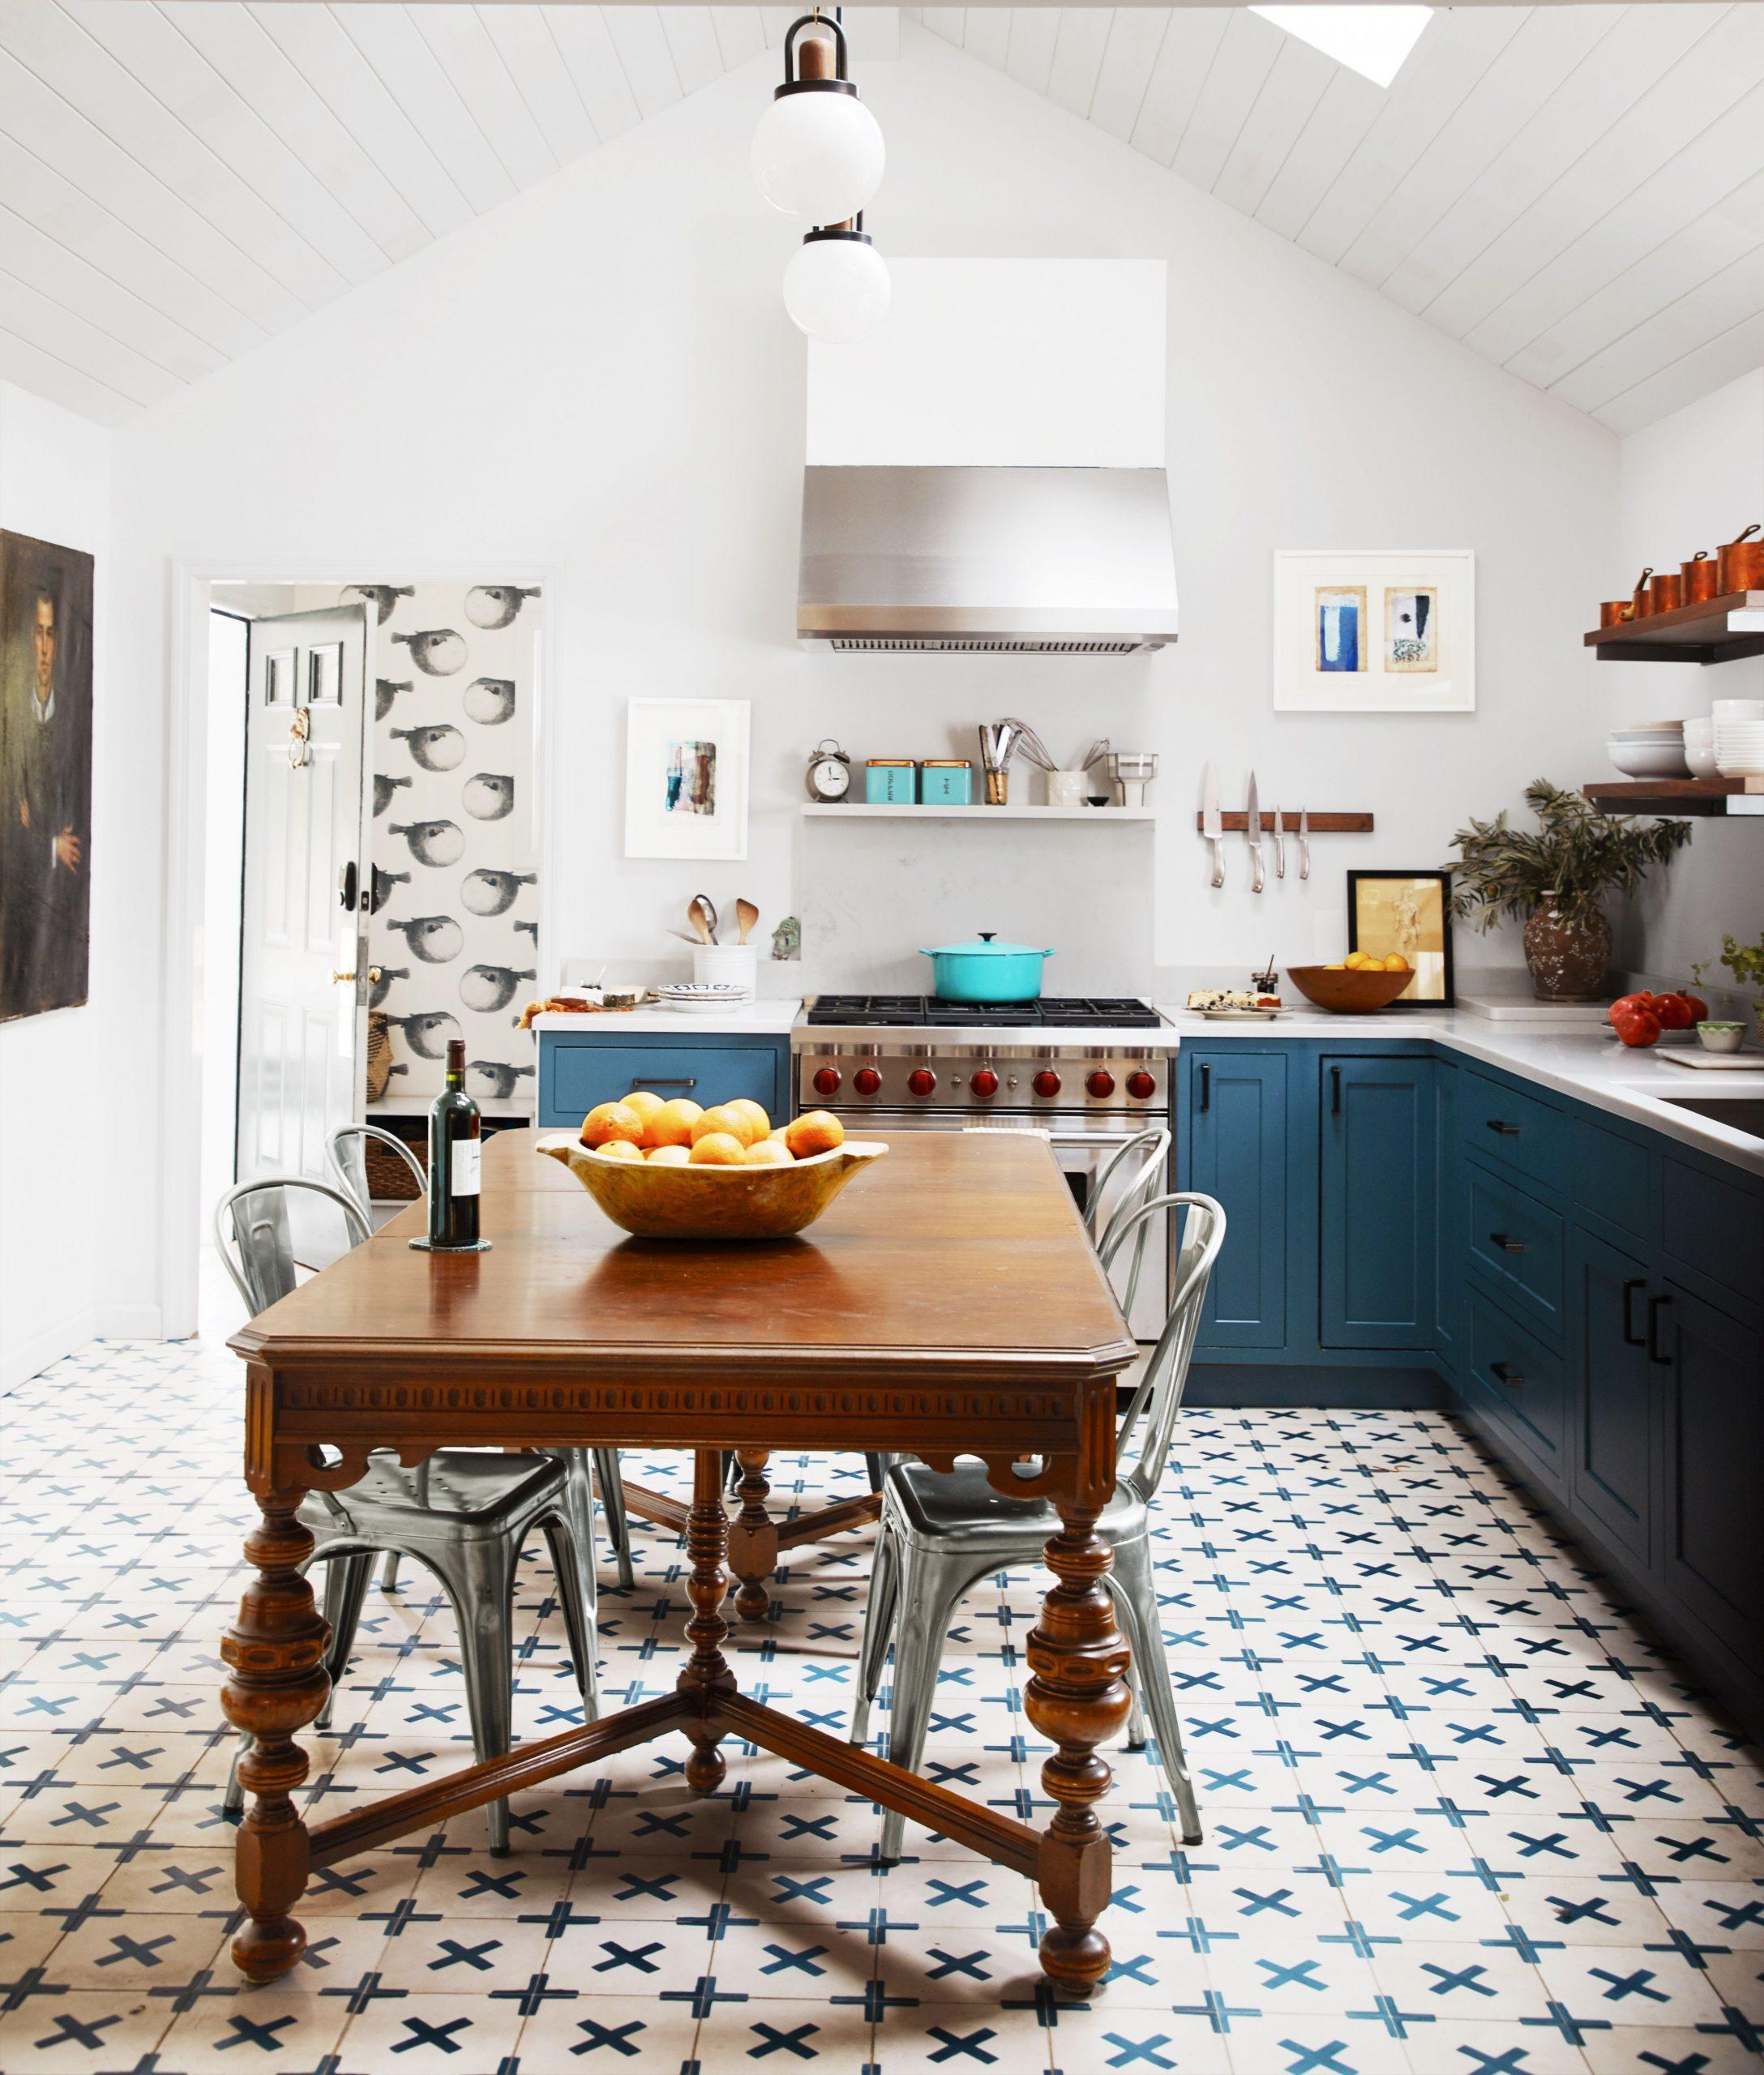 8 Best Kitchen Ideas - Decor and Decorating Ideas for Kitchen Design - Dining Room Kitchen Ideas